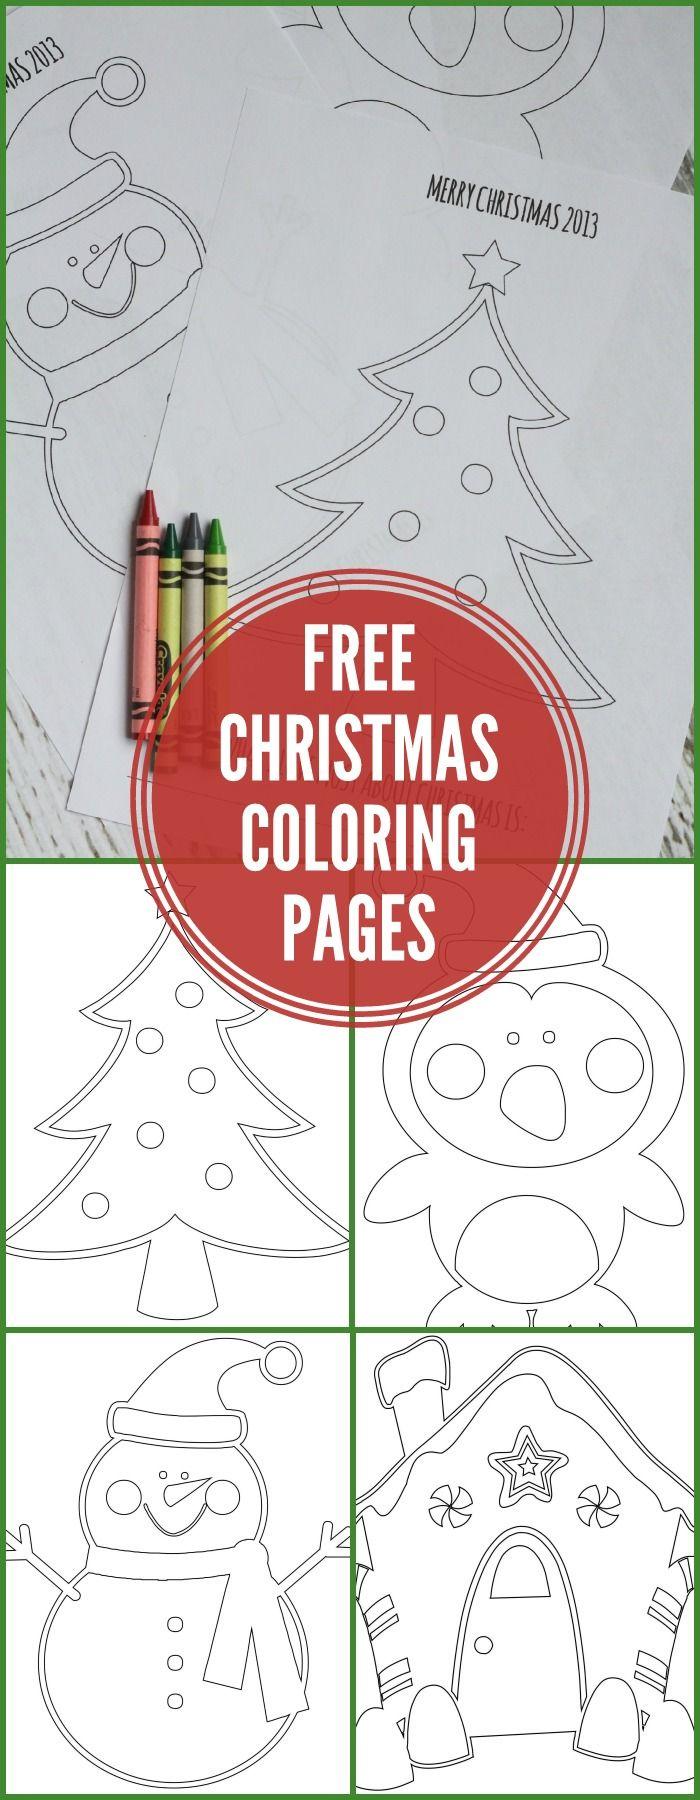 FREE Christmas Coloring Pages on { lilluna.com } | Kleurplaten kids ...